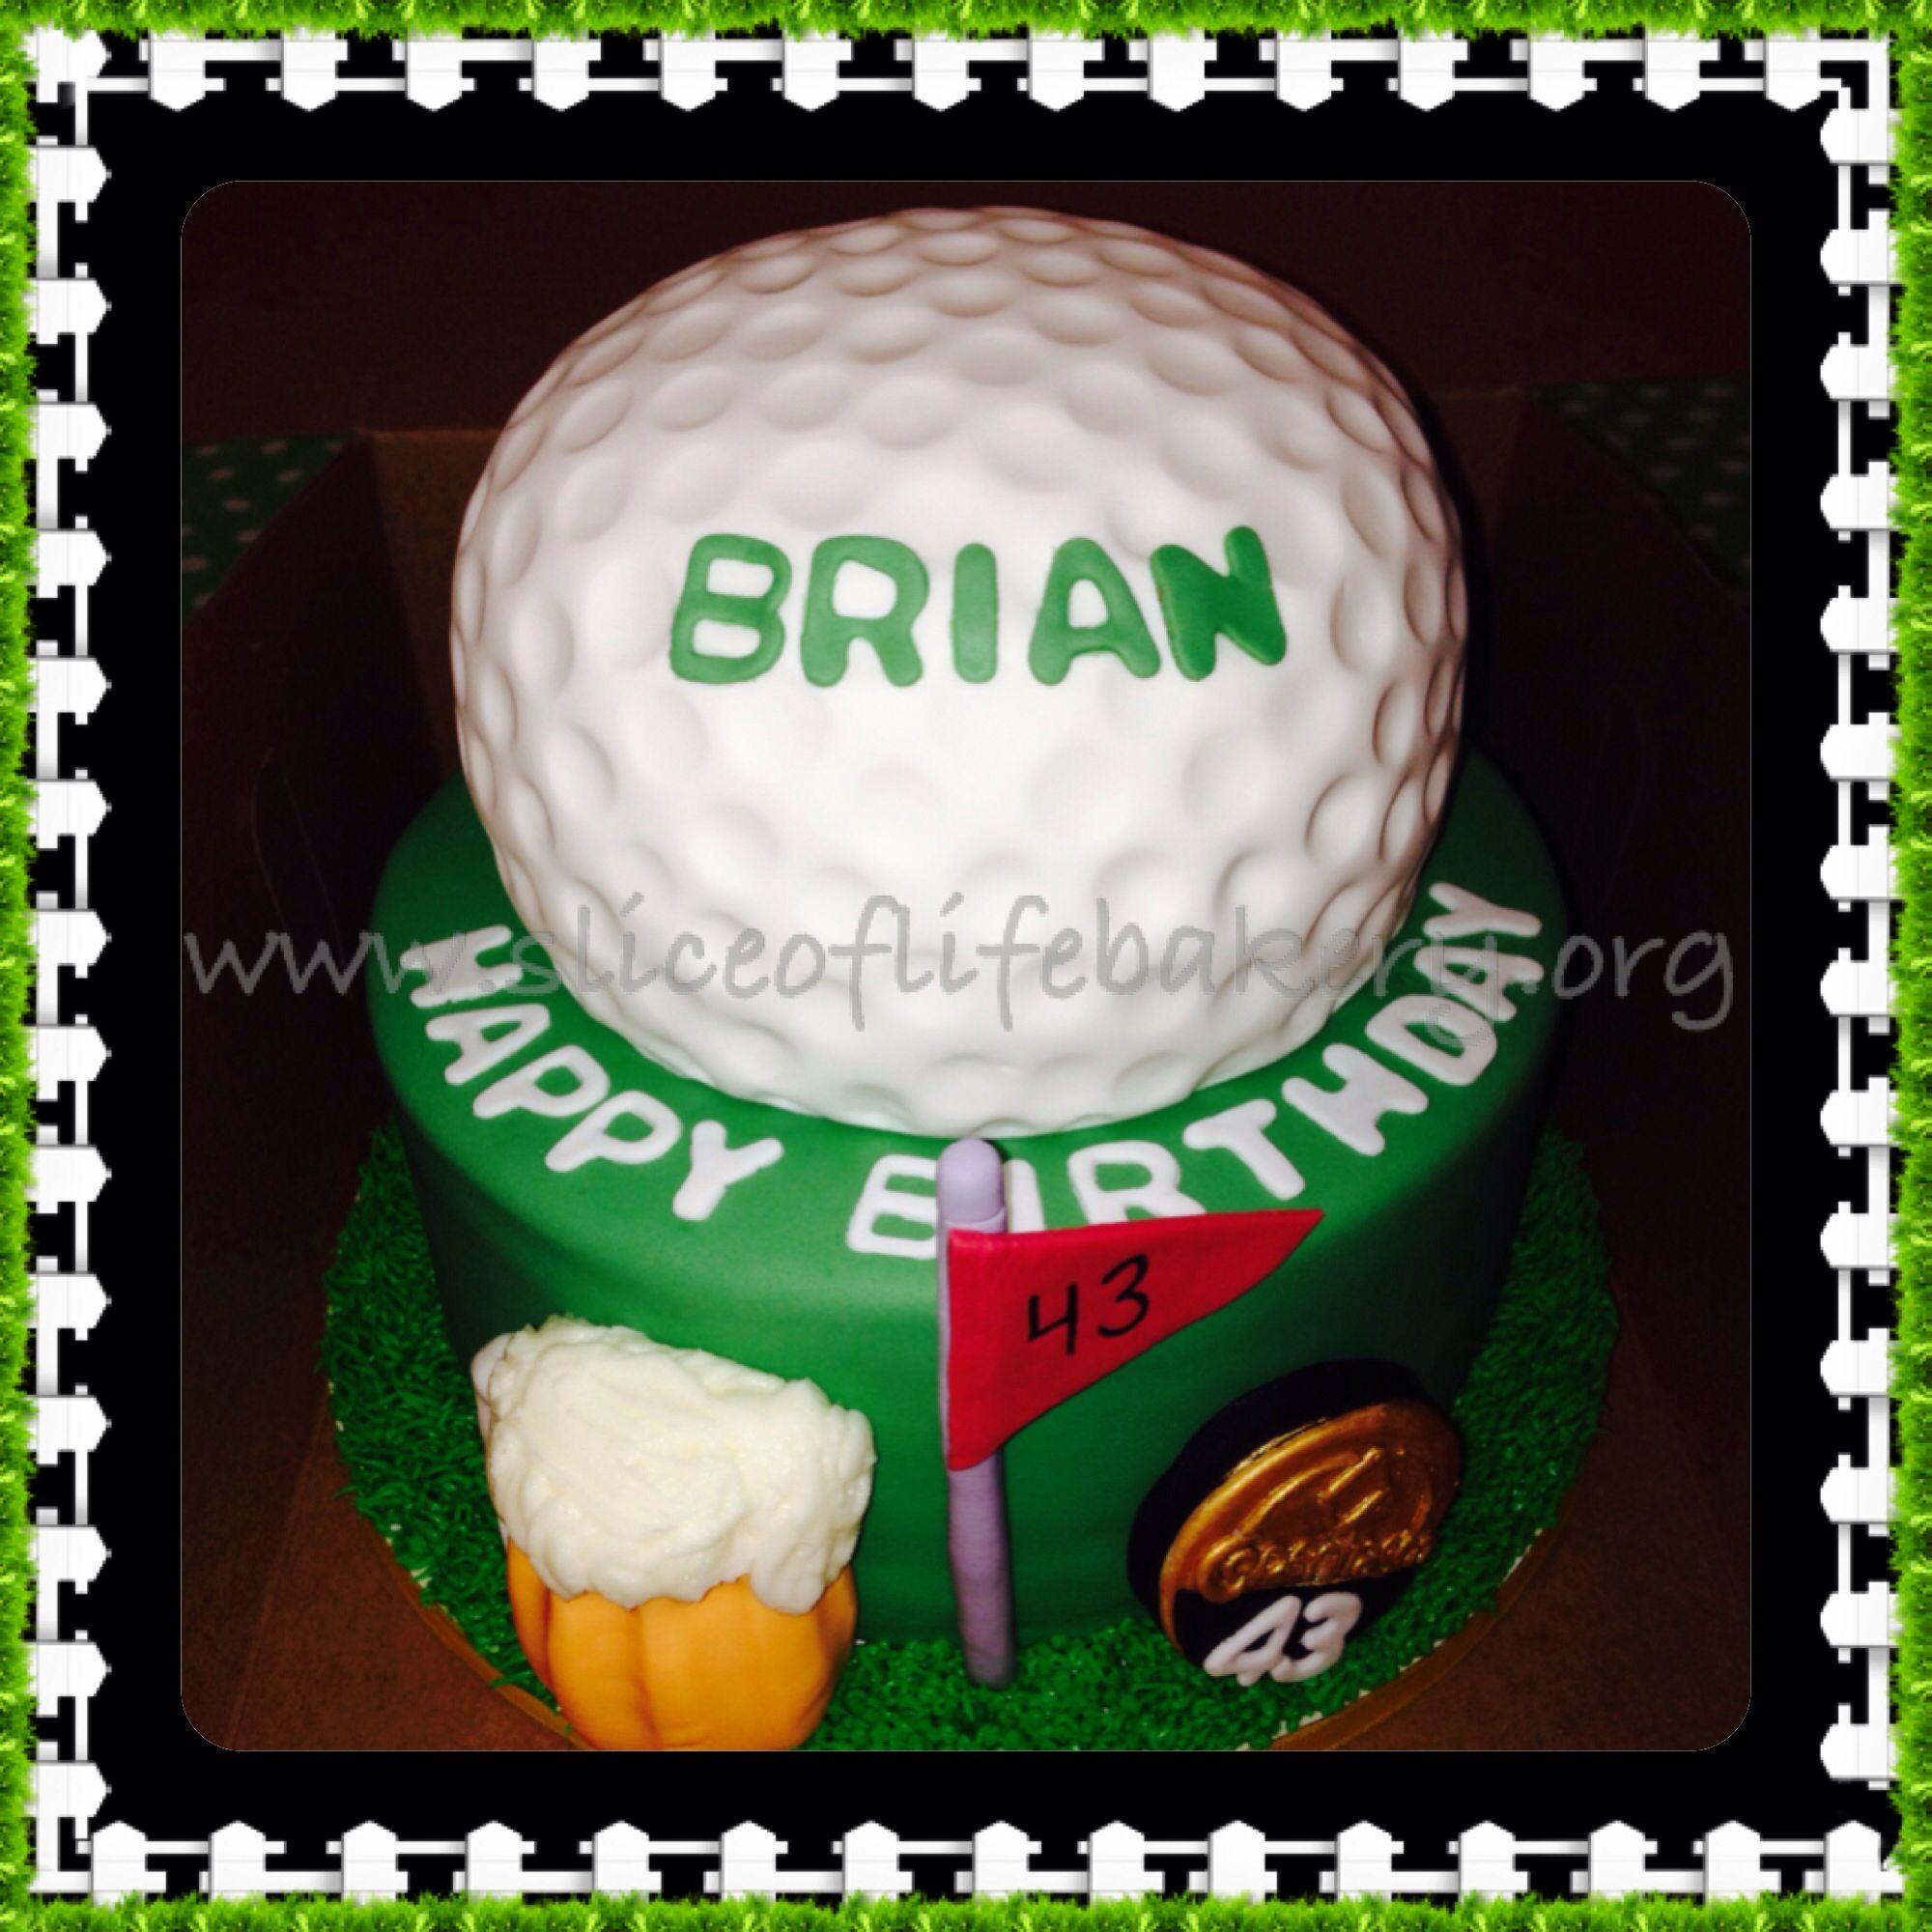 Happy Birthday Brian!!! #golf #cake #Masters2014